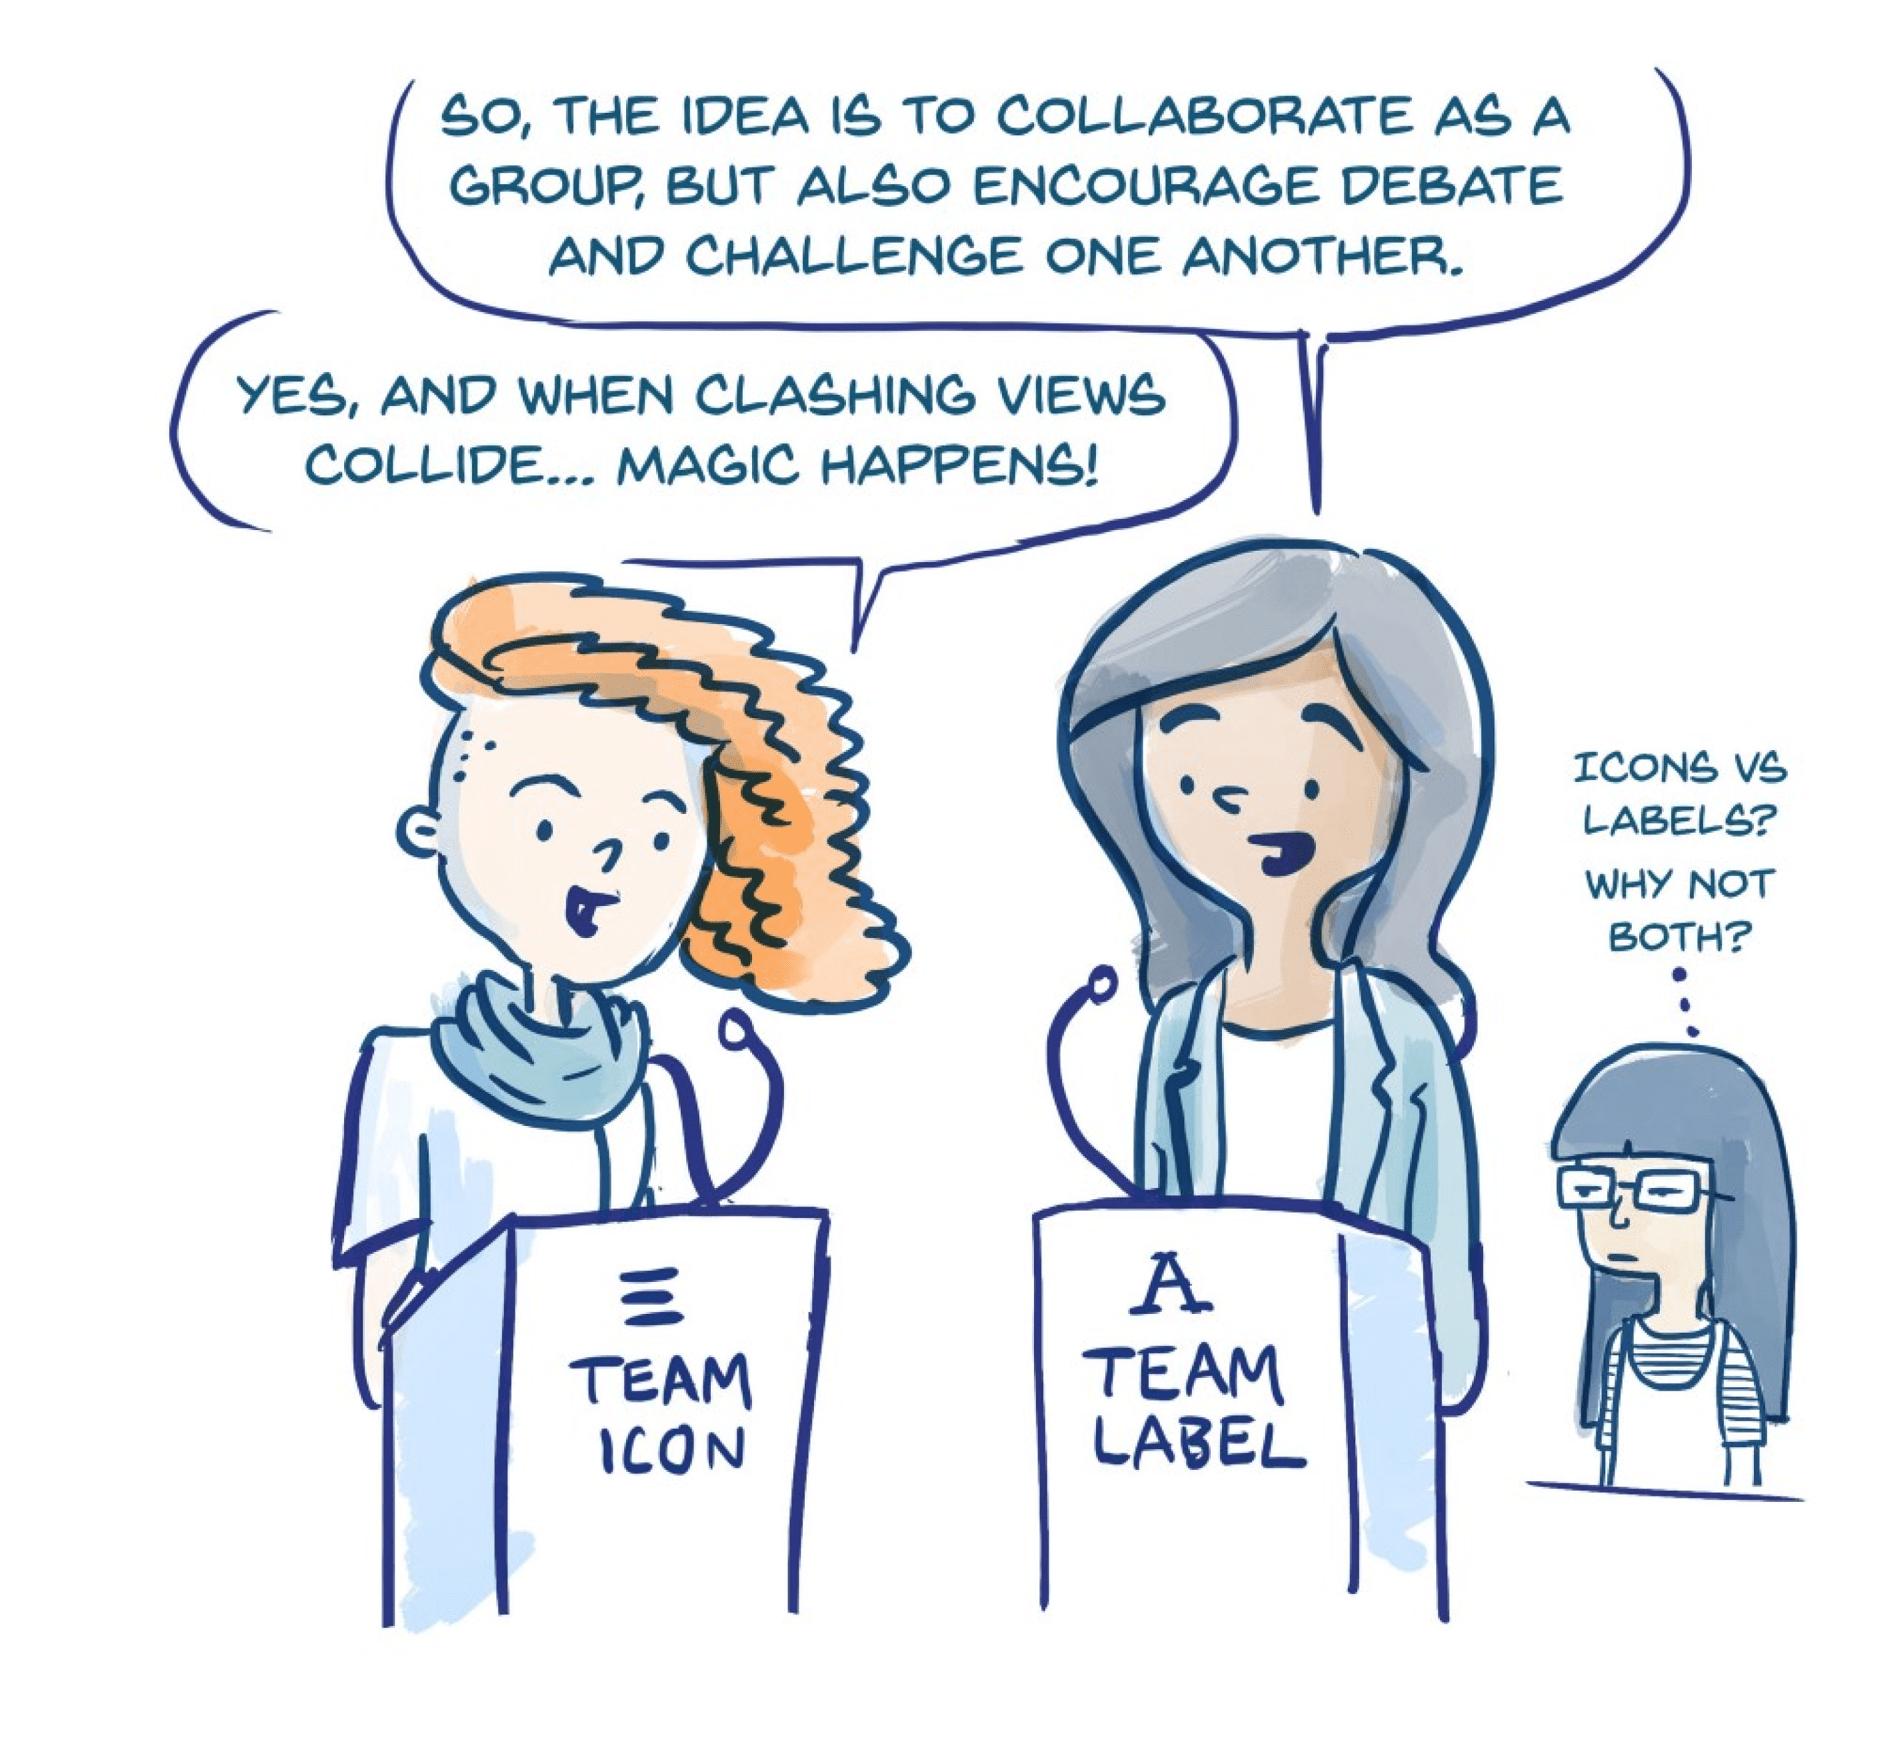 Labels vs Icon illustration